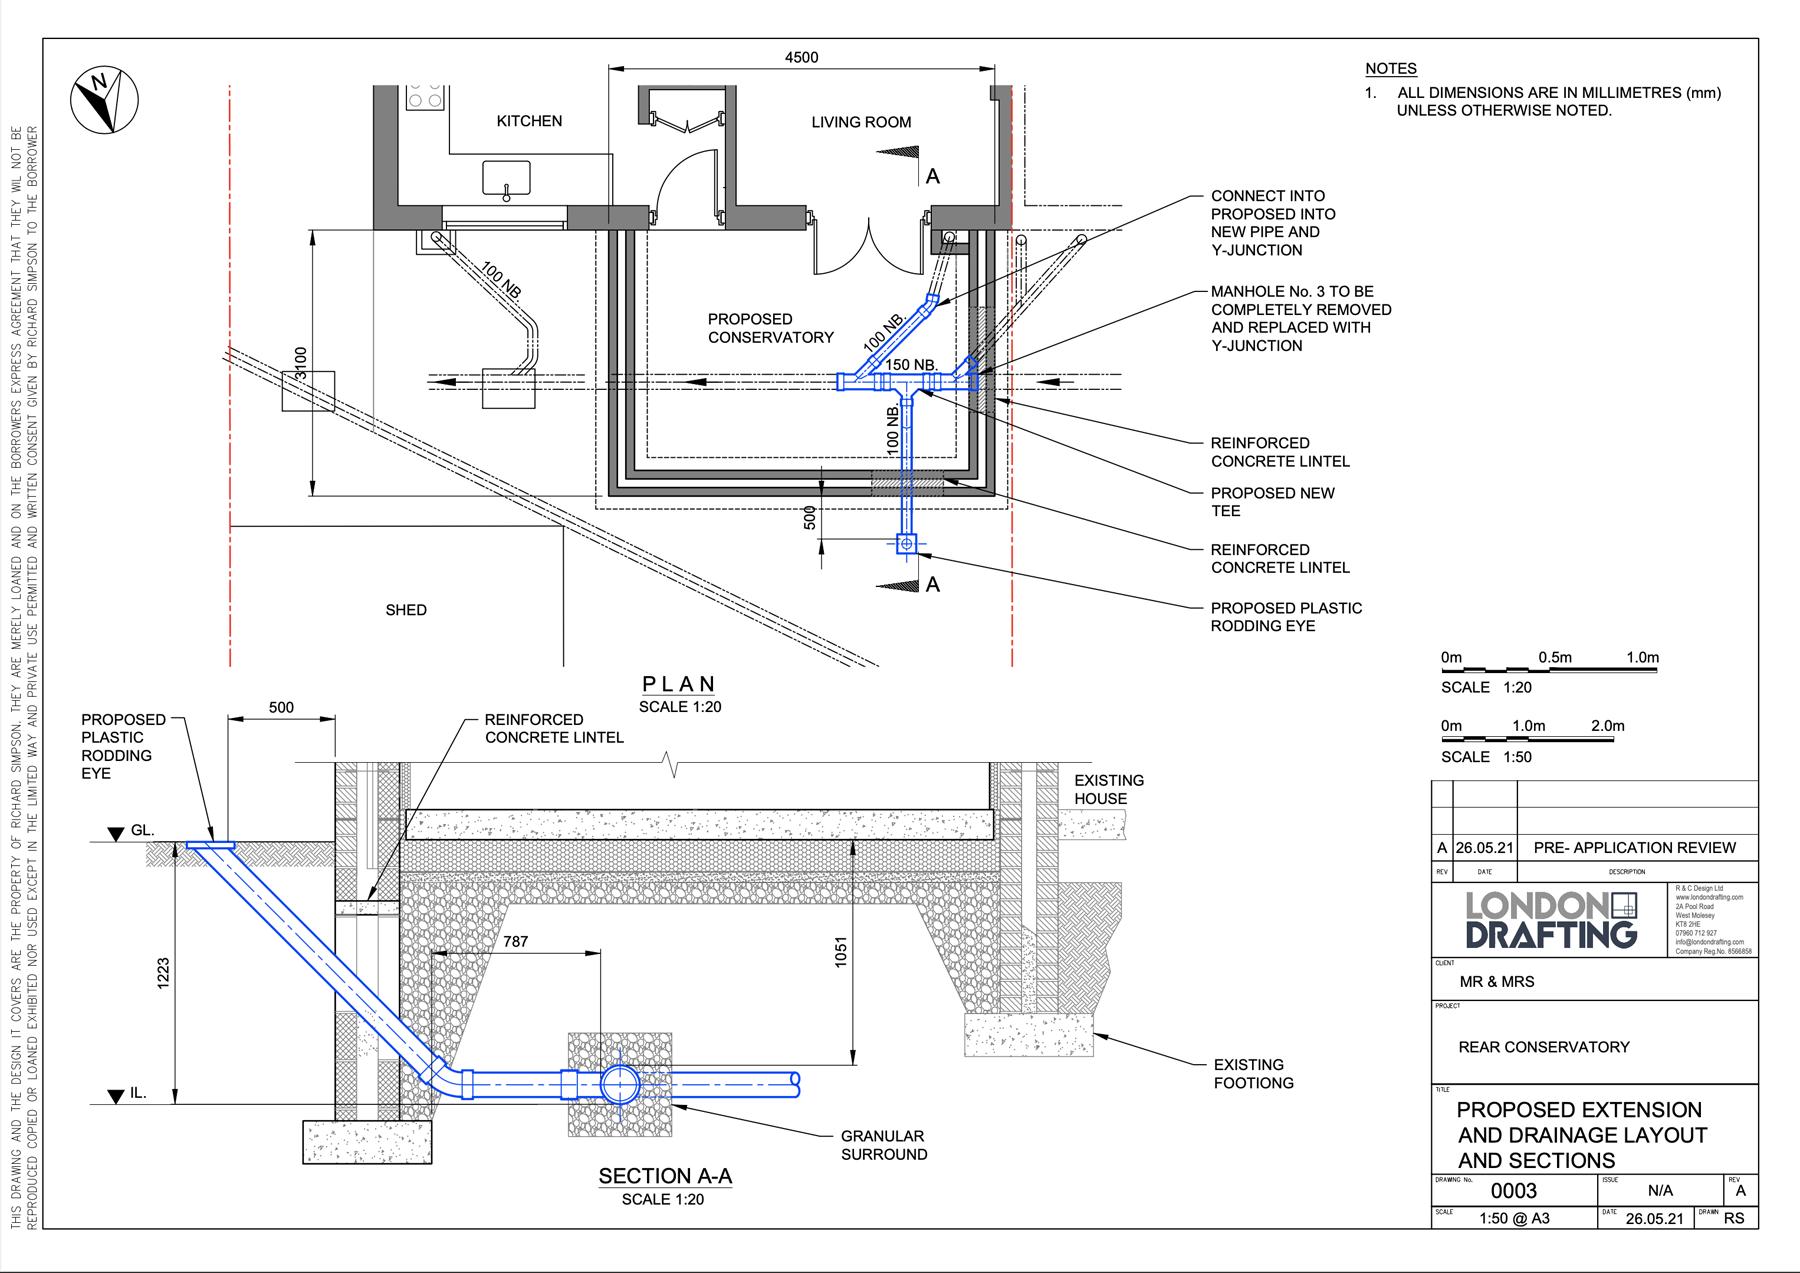 Rear conservatory plan